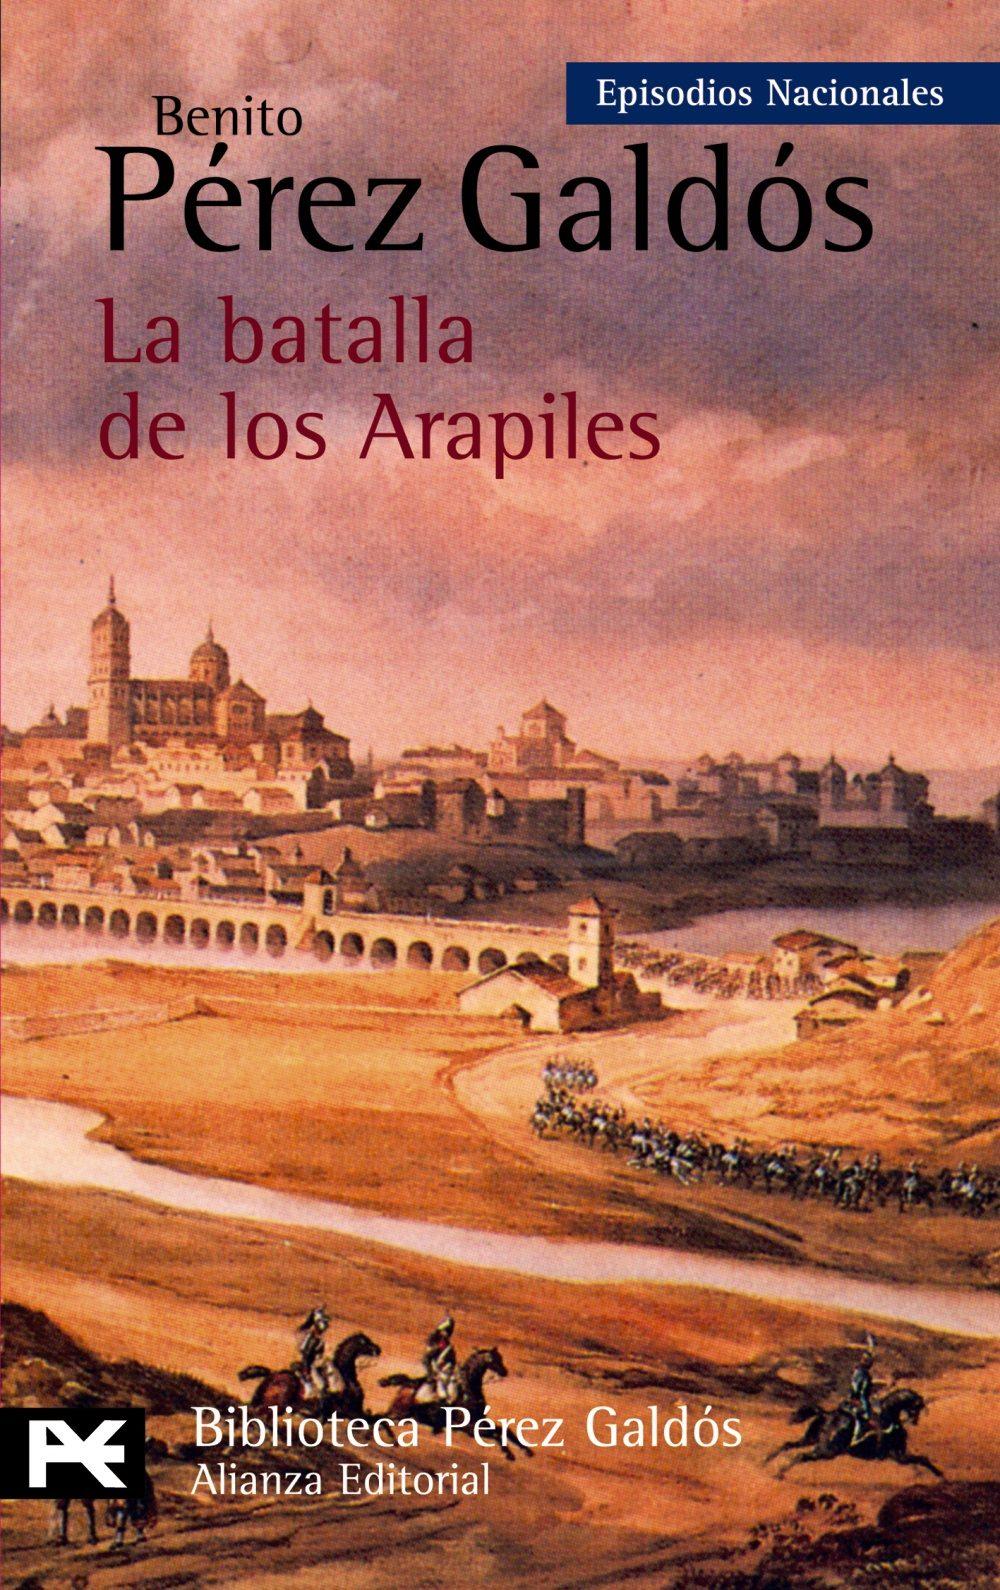 El Cultural – La Batalla de los Arapiles